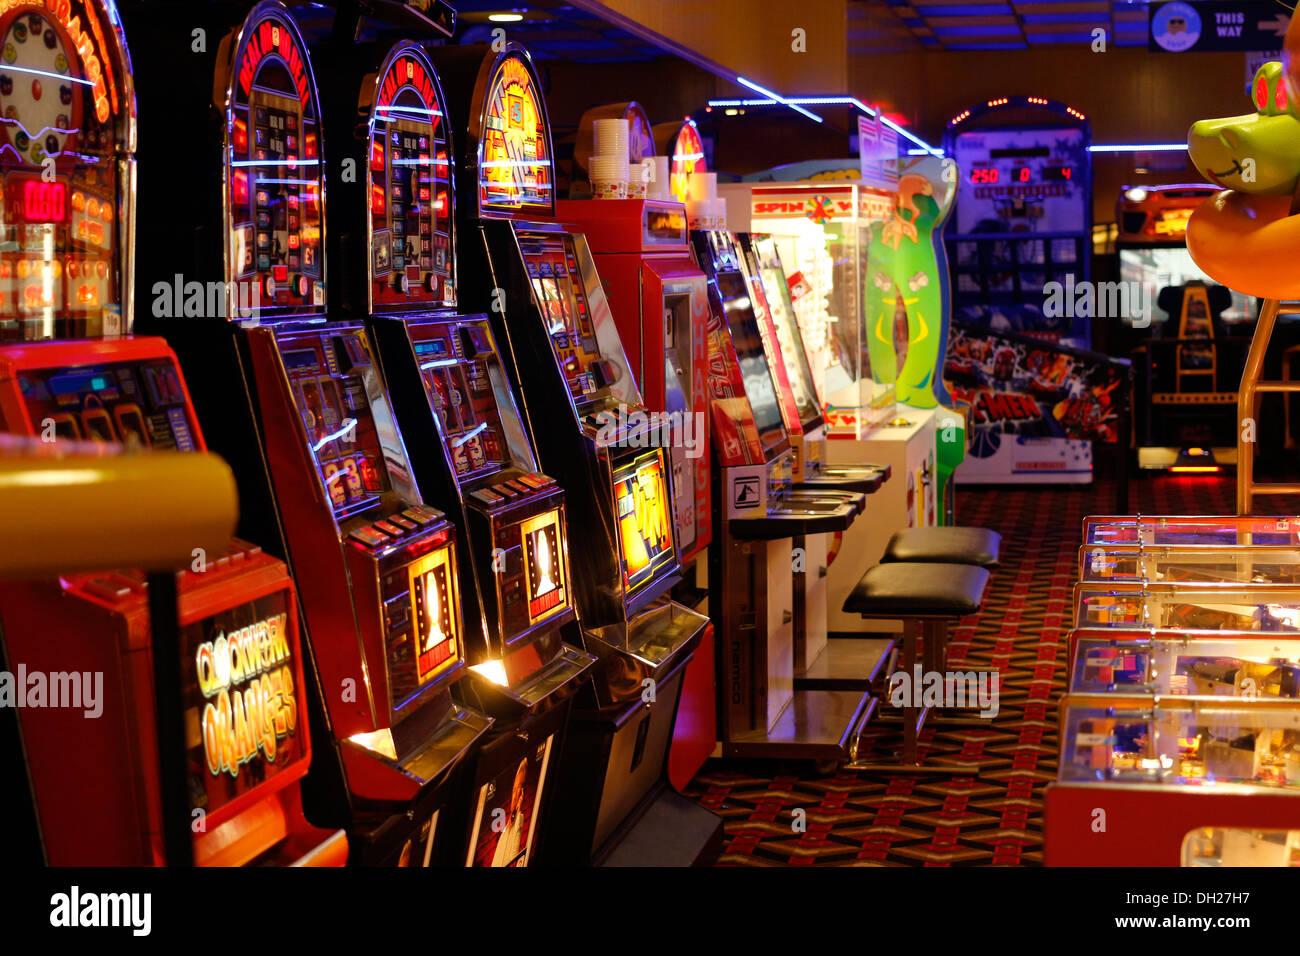 Gambling arcades gambling a sport